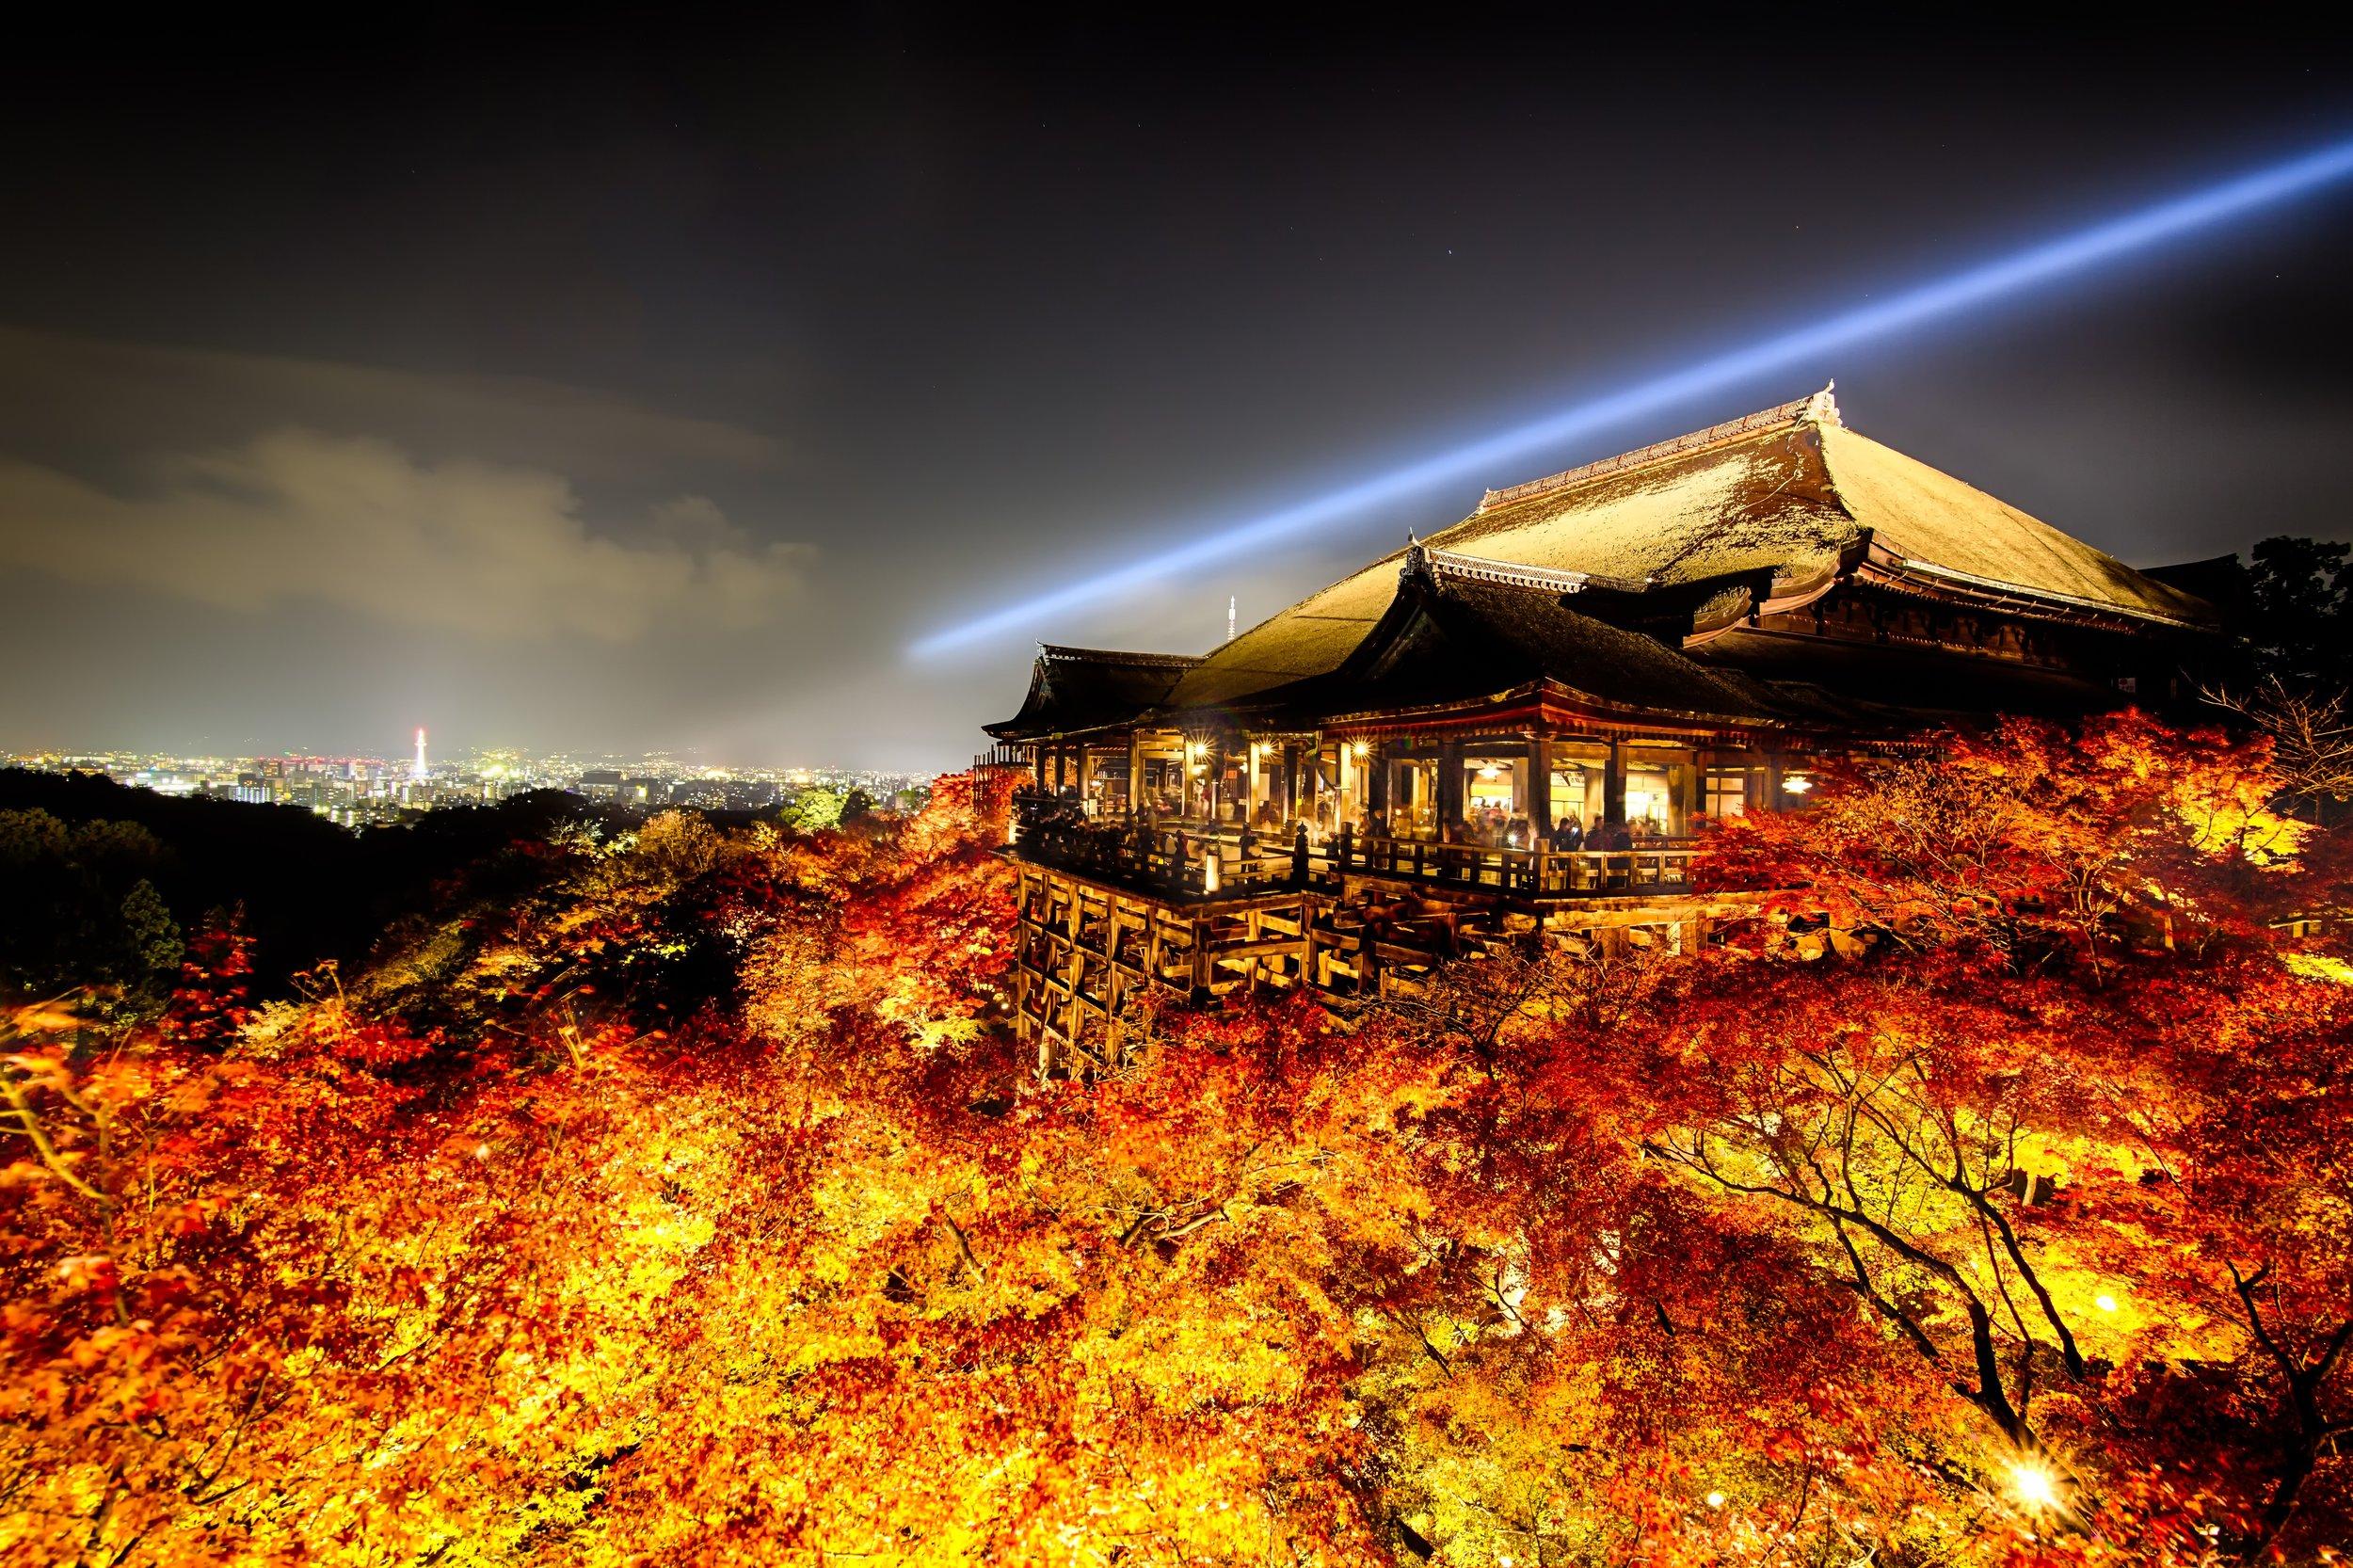 PHOTOGRAPHY: Andy Yee • Canon EOS 5D MkIII • 16-28mm Ƒ/2.8 @ 16MM • Ƒ/9 • bulb • ISO 100